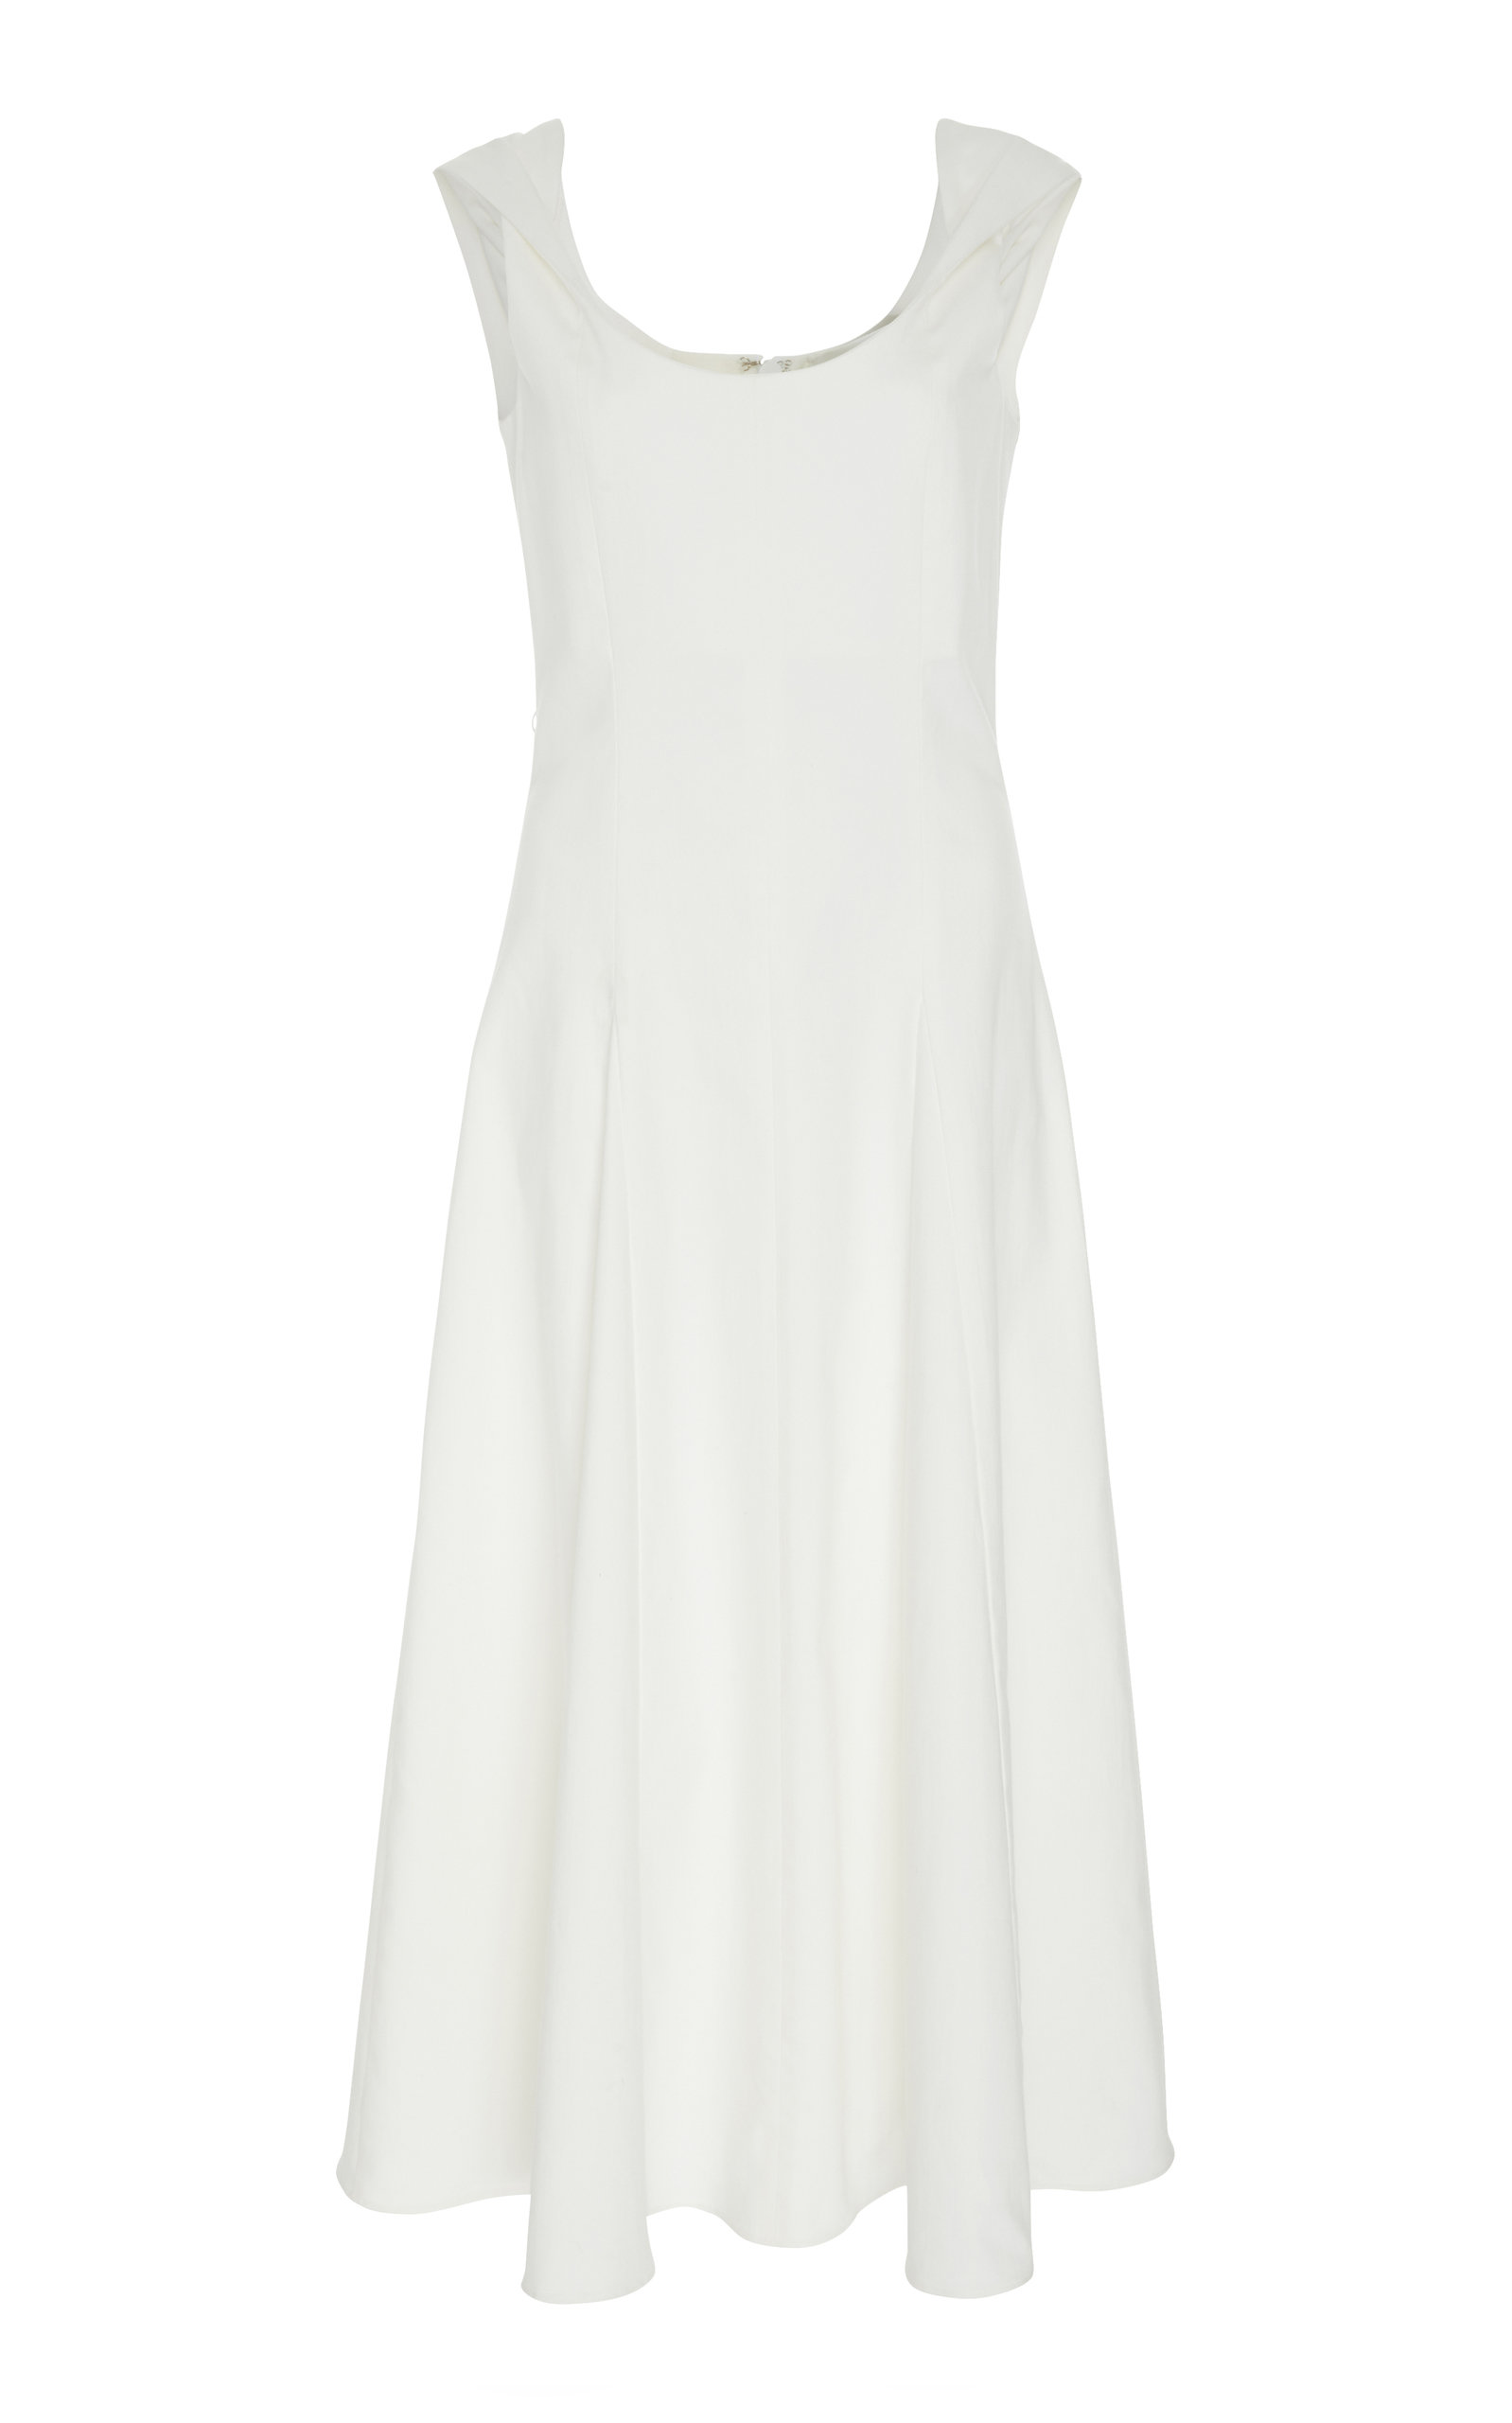 ARIAS SLEEVELESS COTTON BLEND DRESS